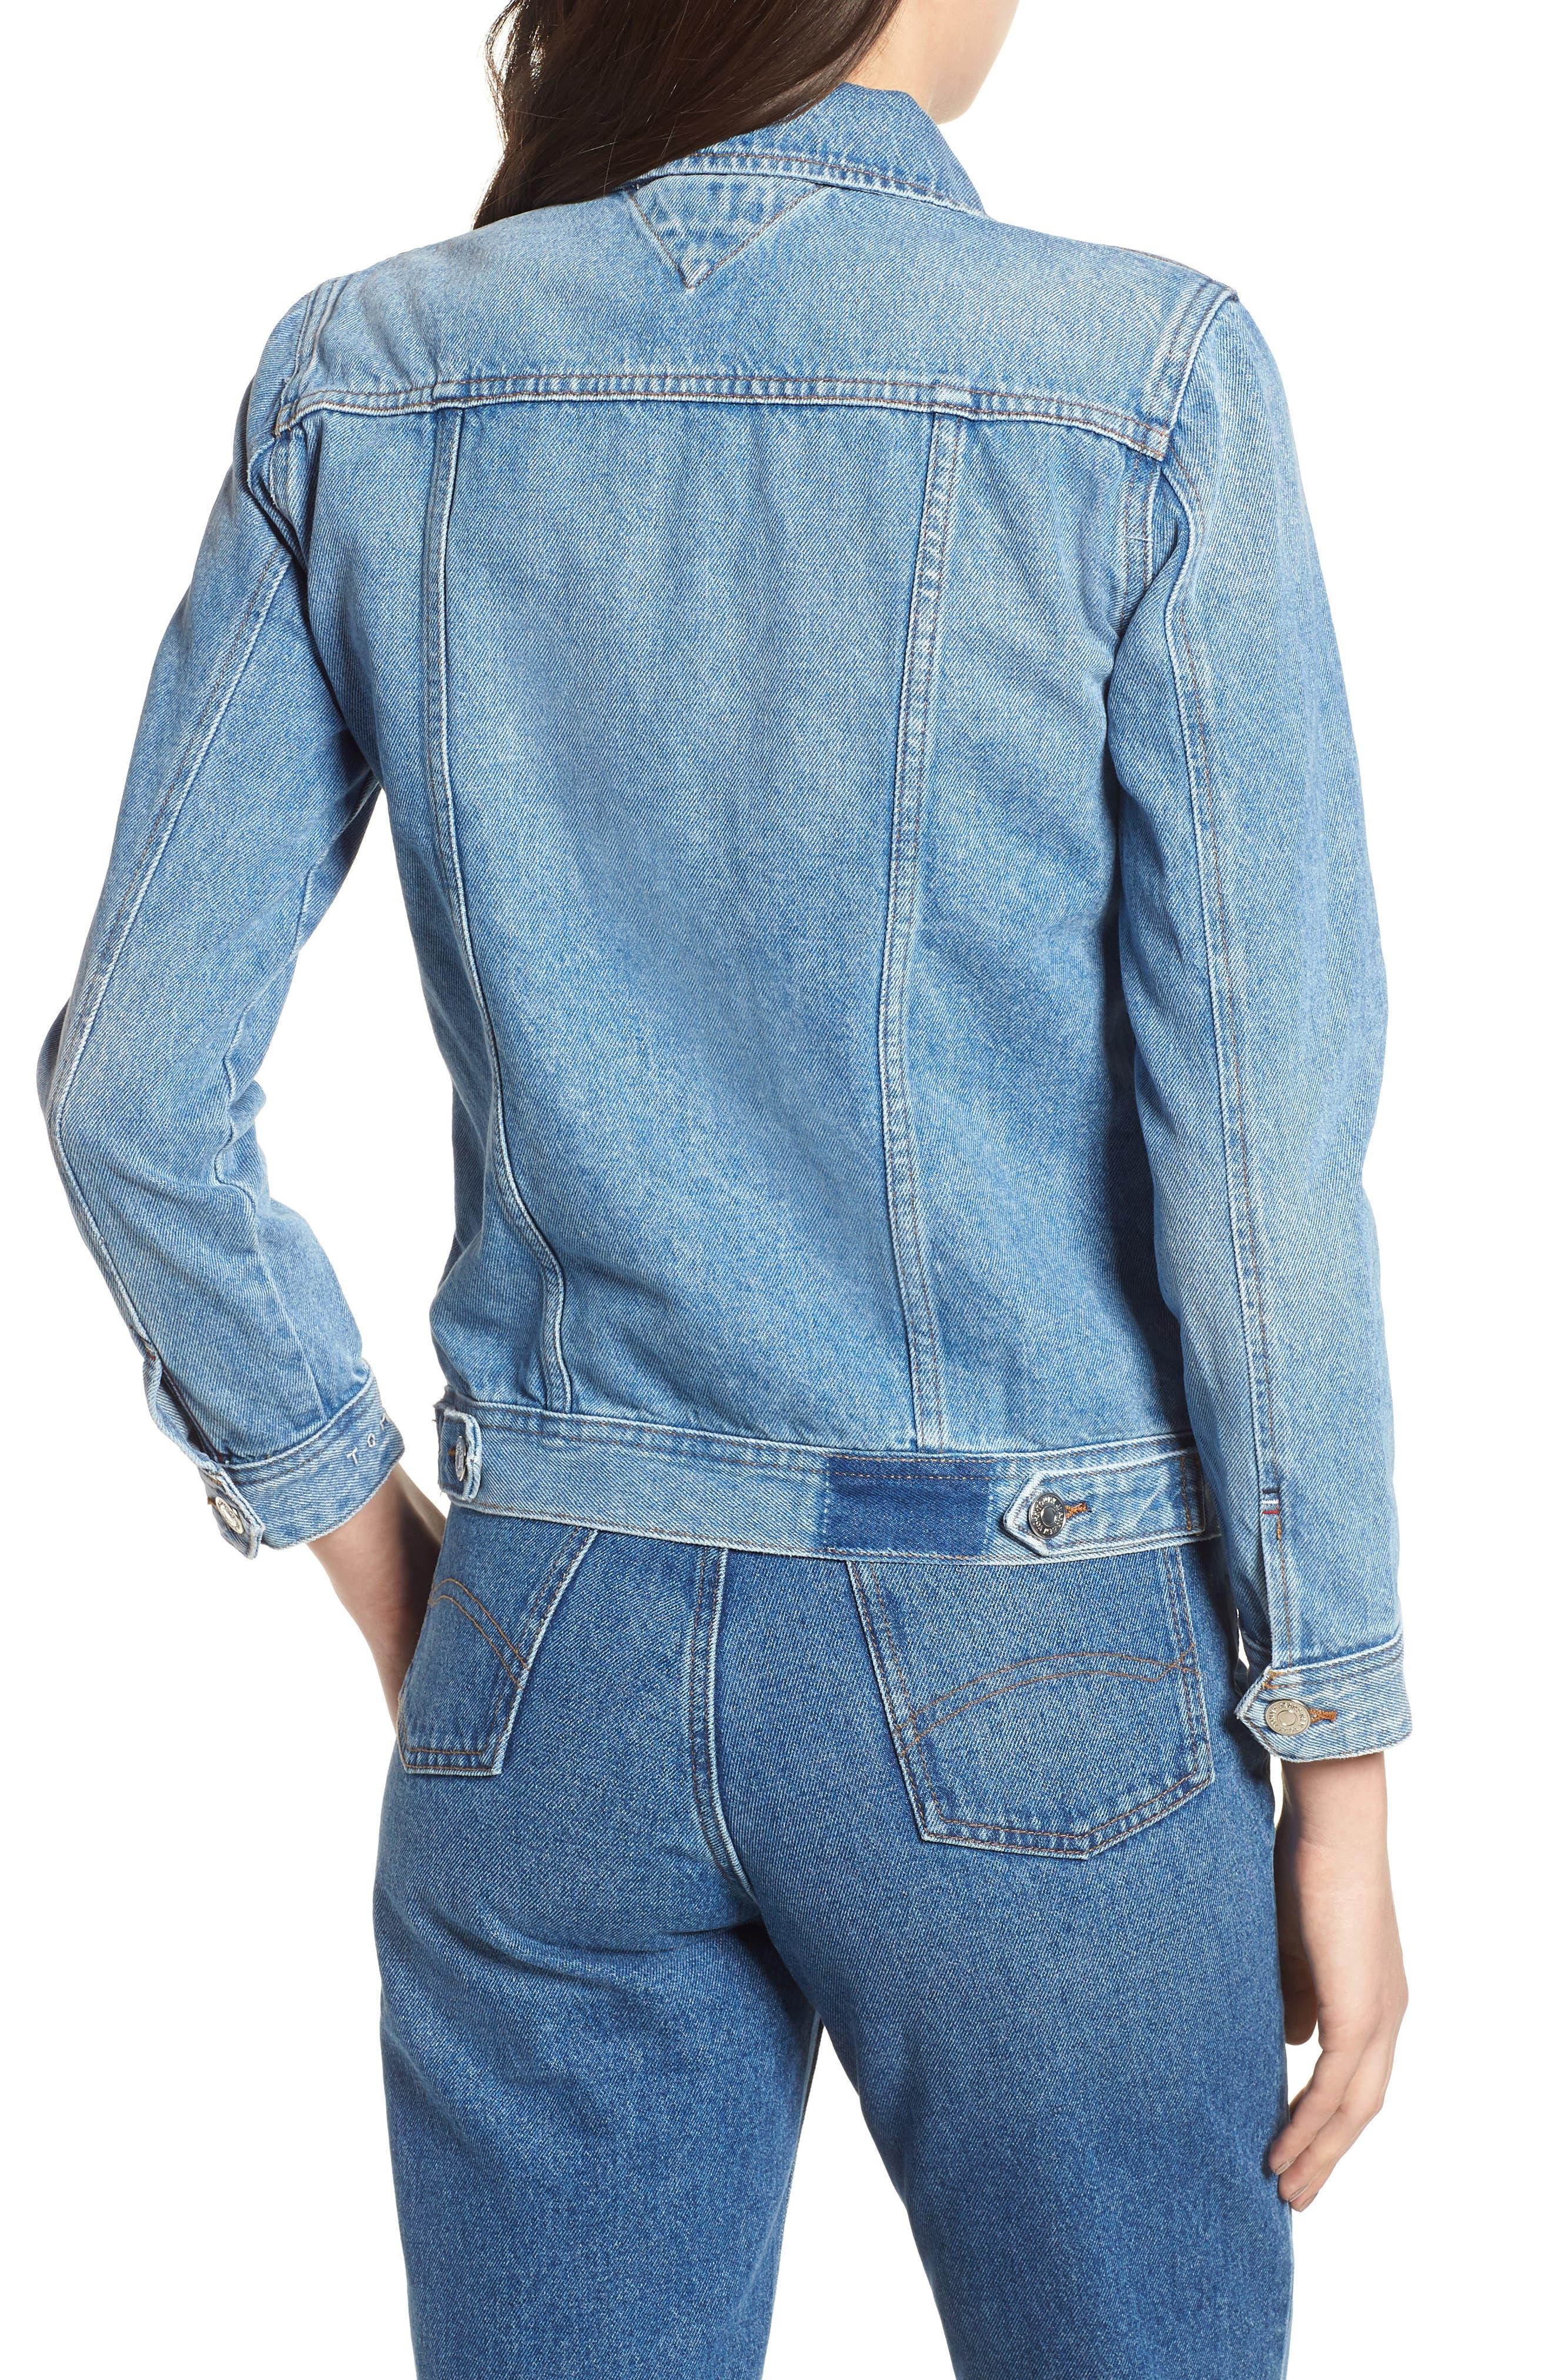 Denim Trucker Jacket,                             Alternate thumbnail 3, color,                             Tommy Jeans Light Blue Rigid